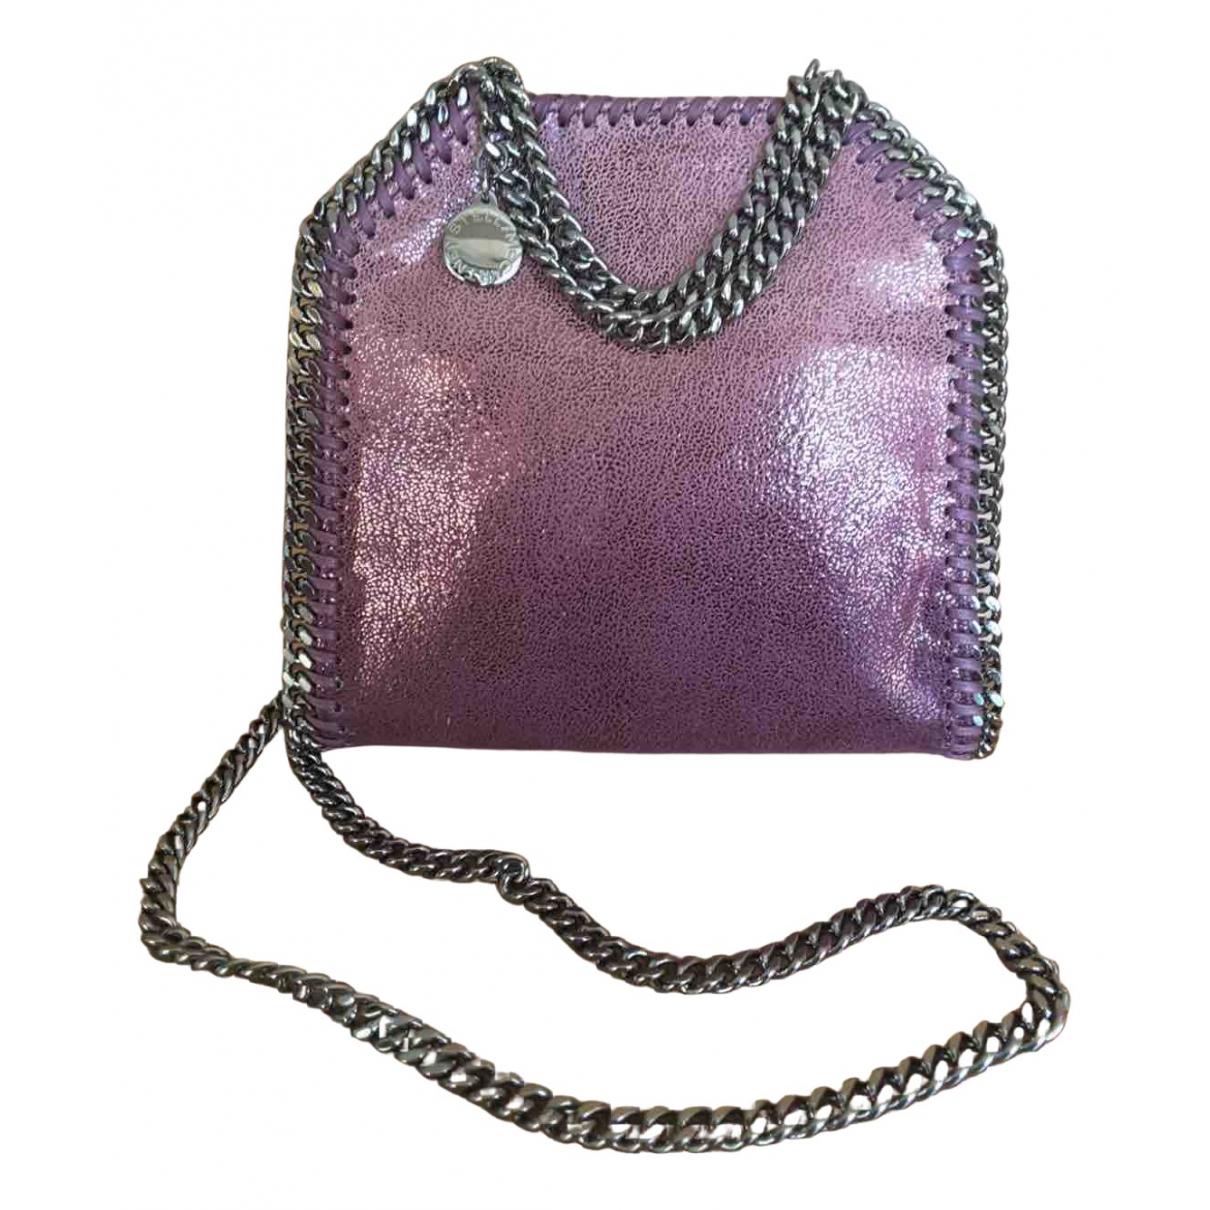 Stella Mccartney Falabella Handtasche in  Rosa Leinen